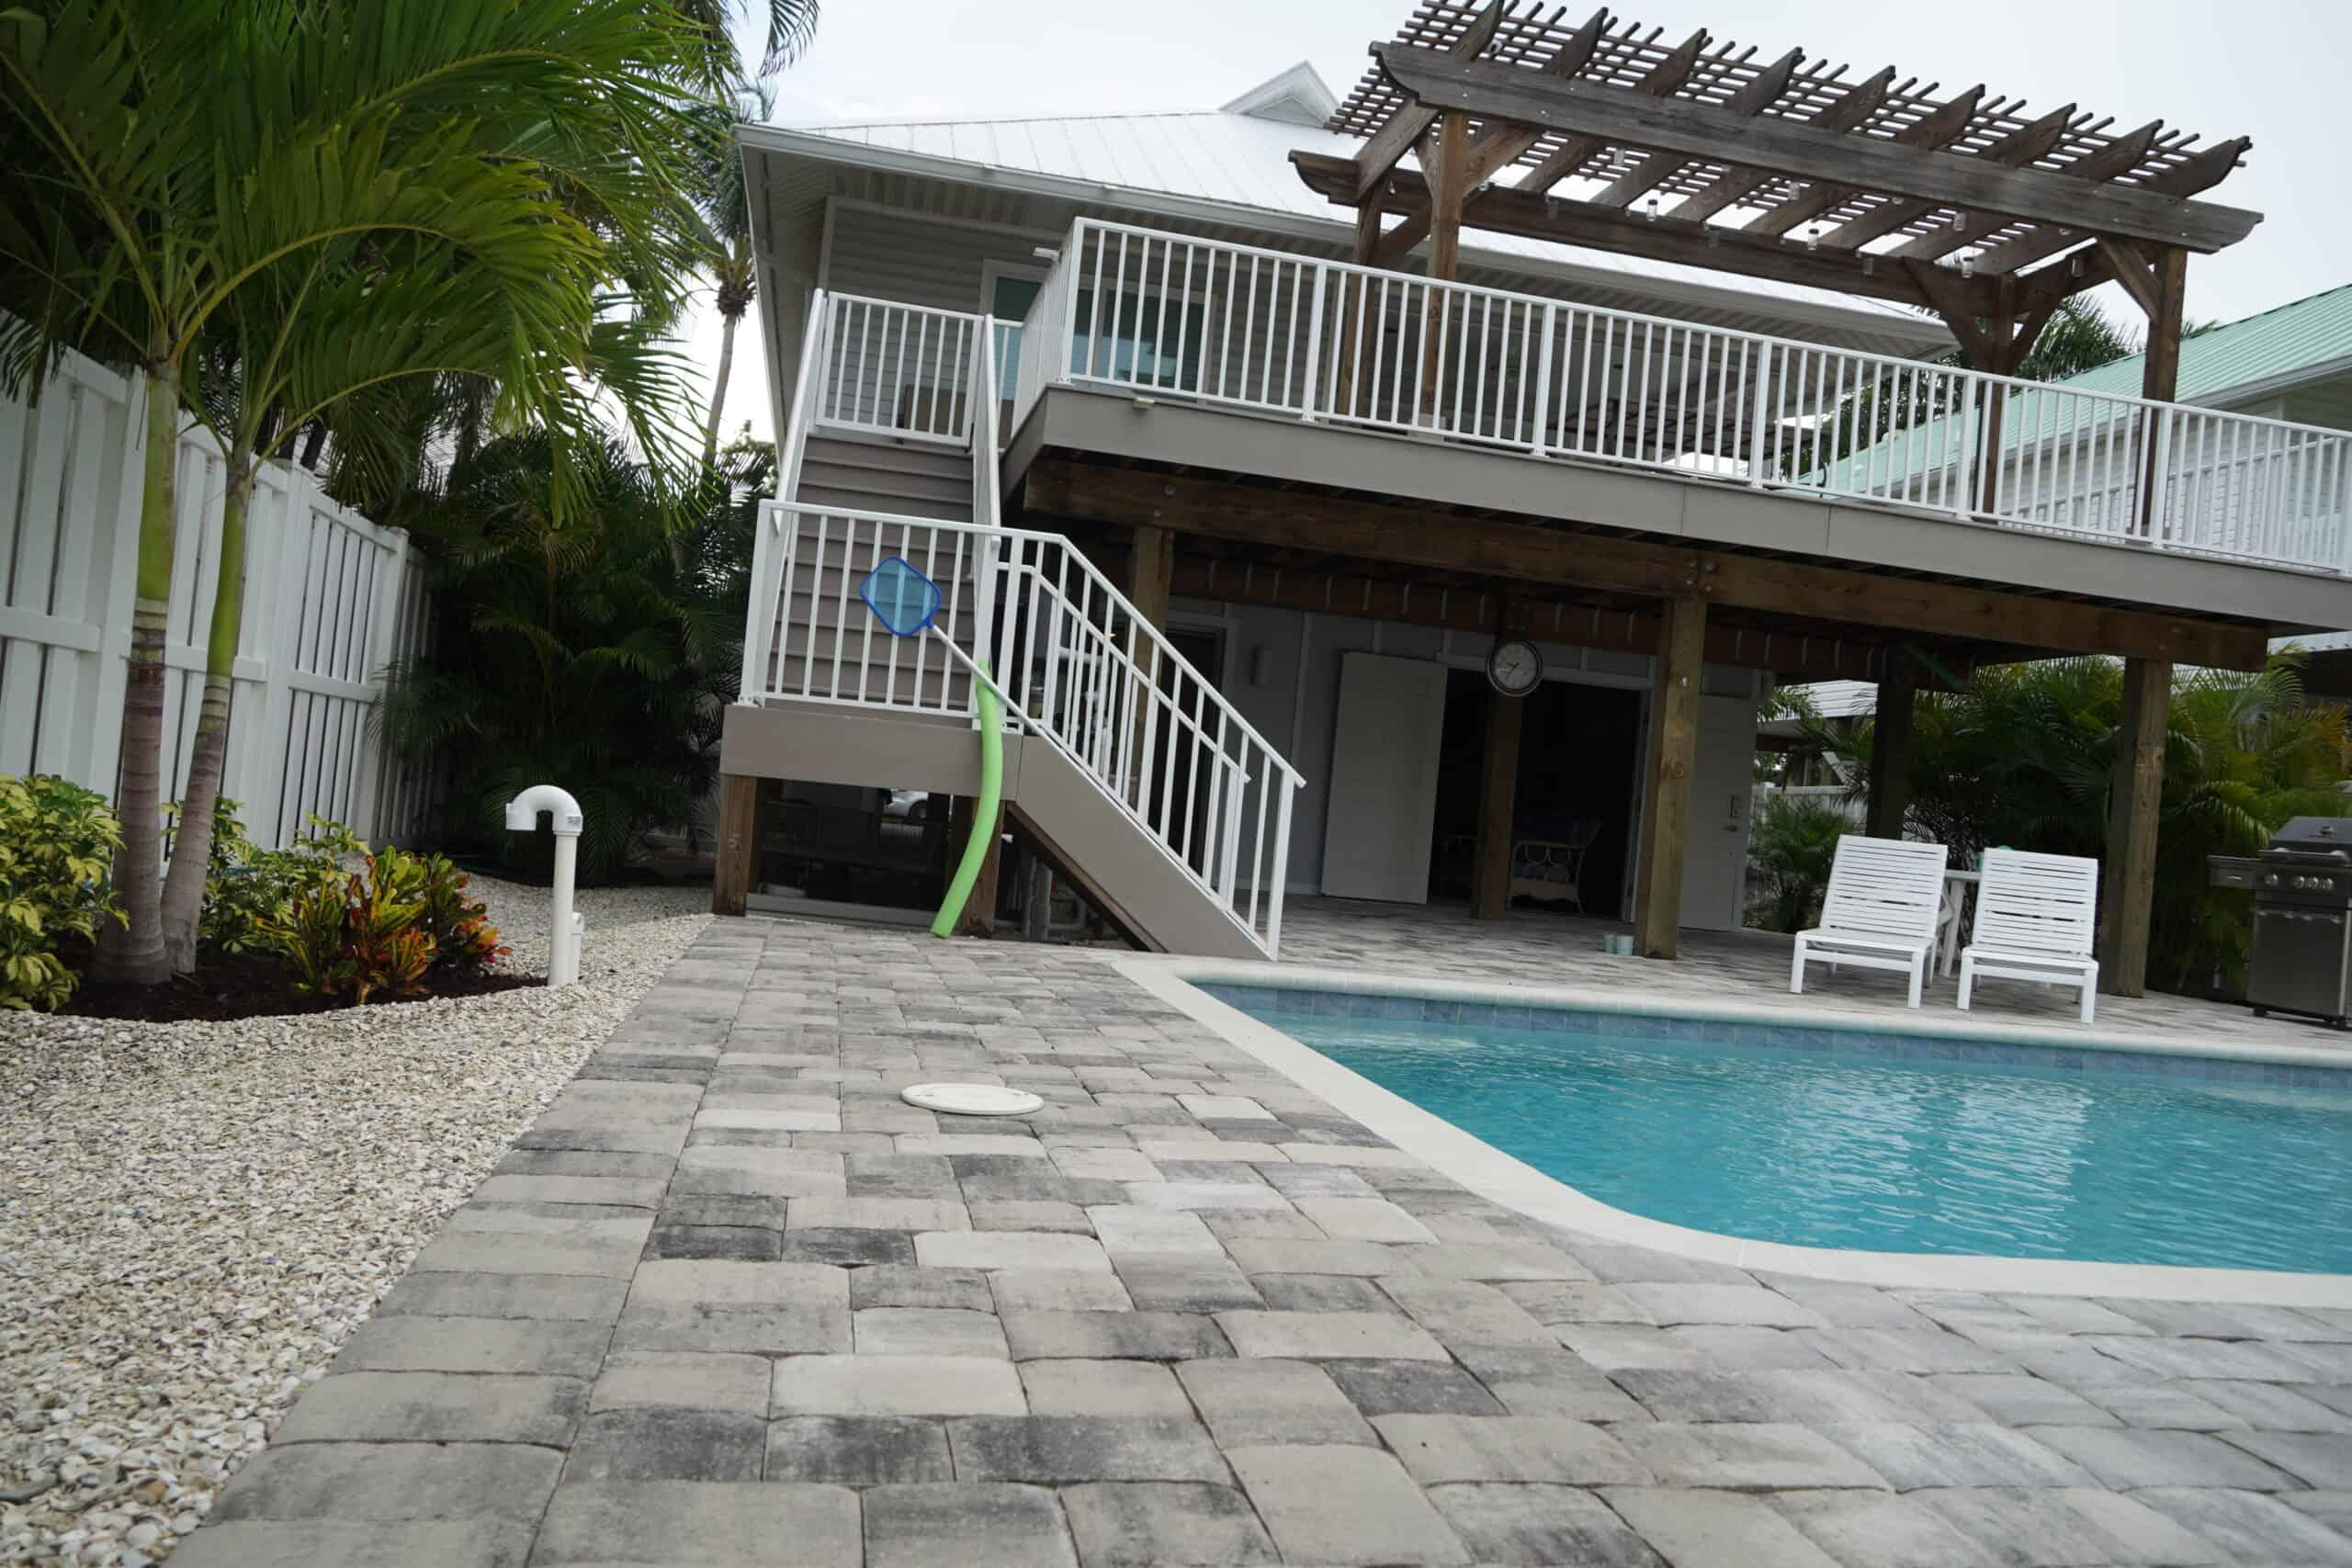 Naples FL Pool Deck Paver Installation A